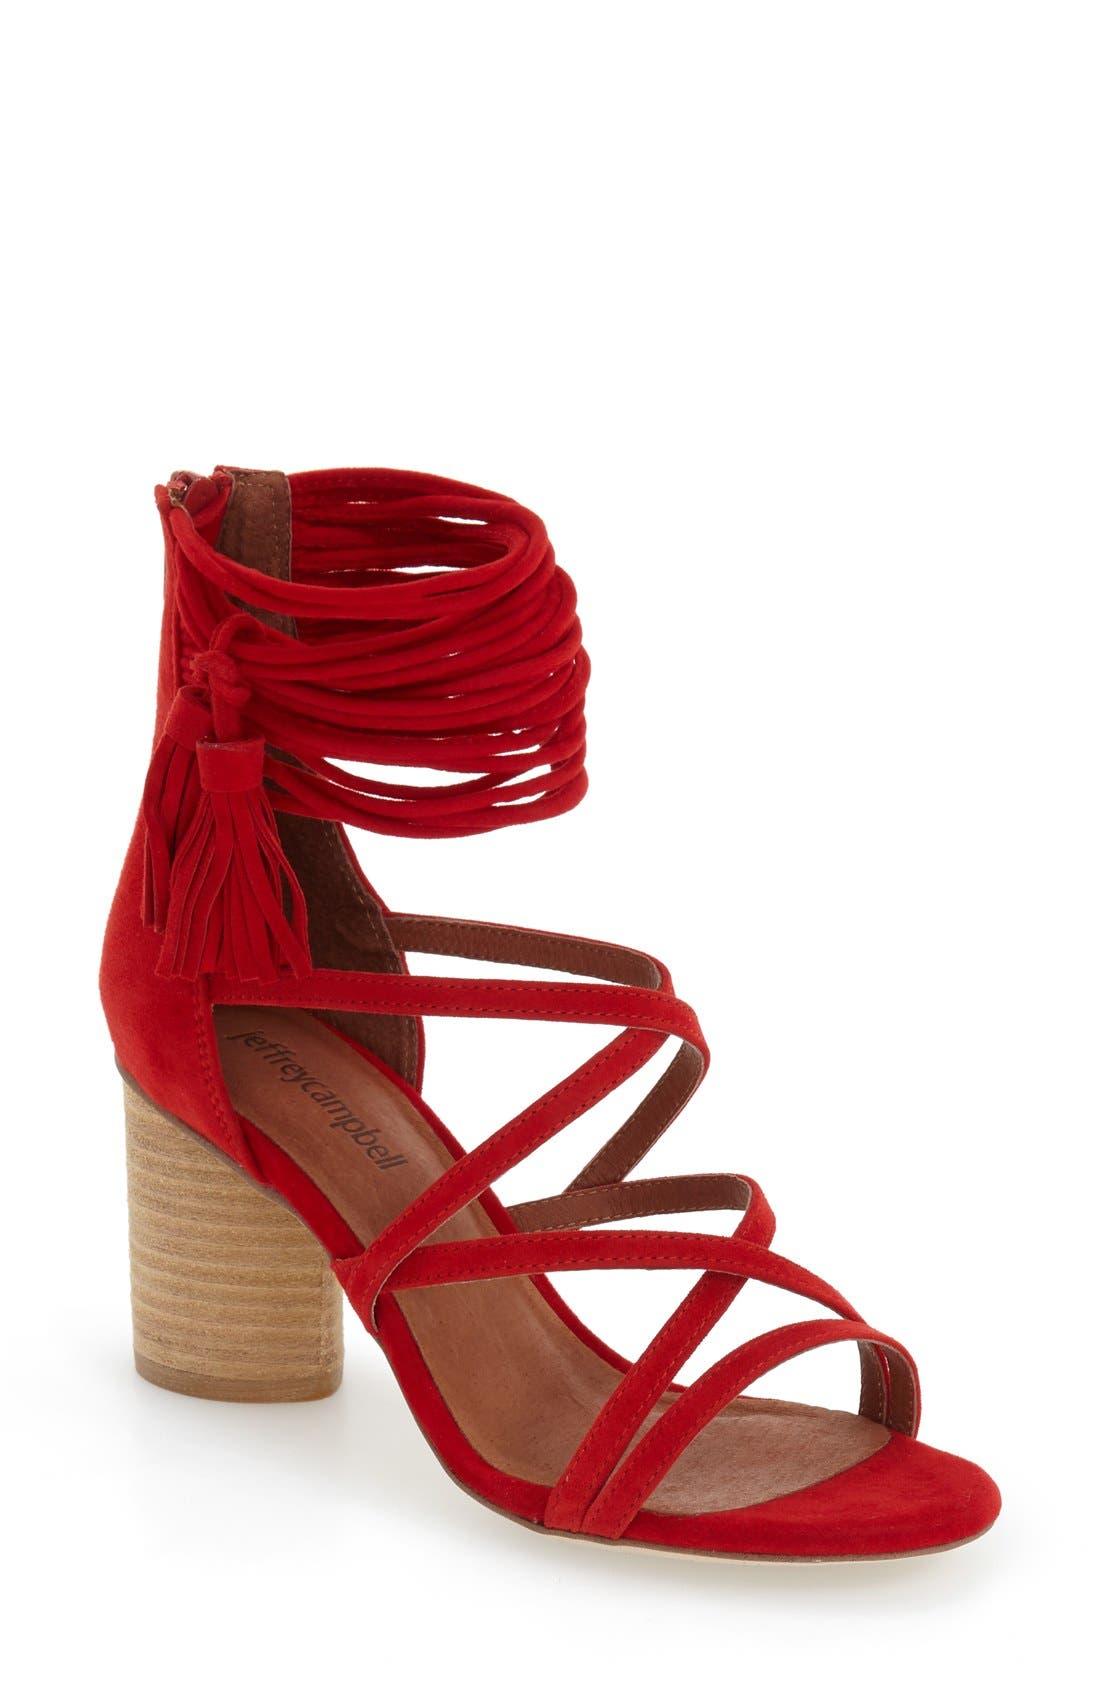 Newest Styles Pumps Fashion Unisex Bright Q90602748